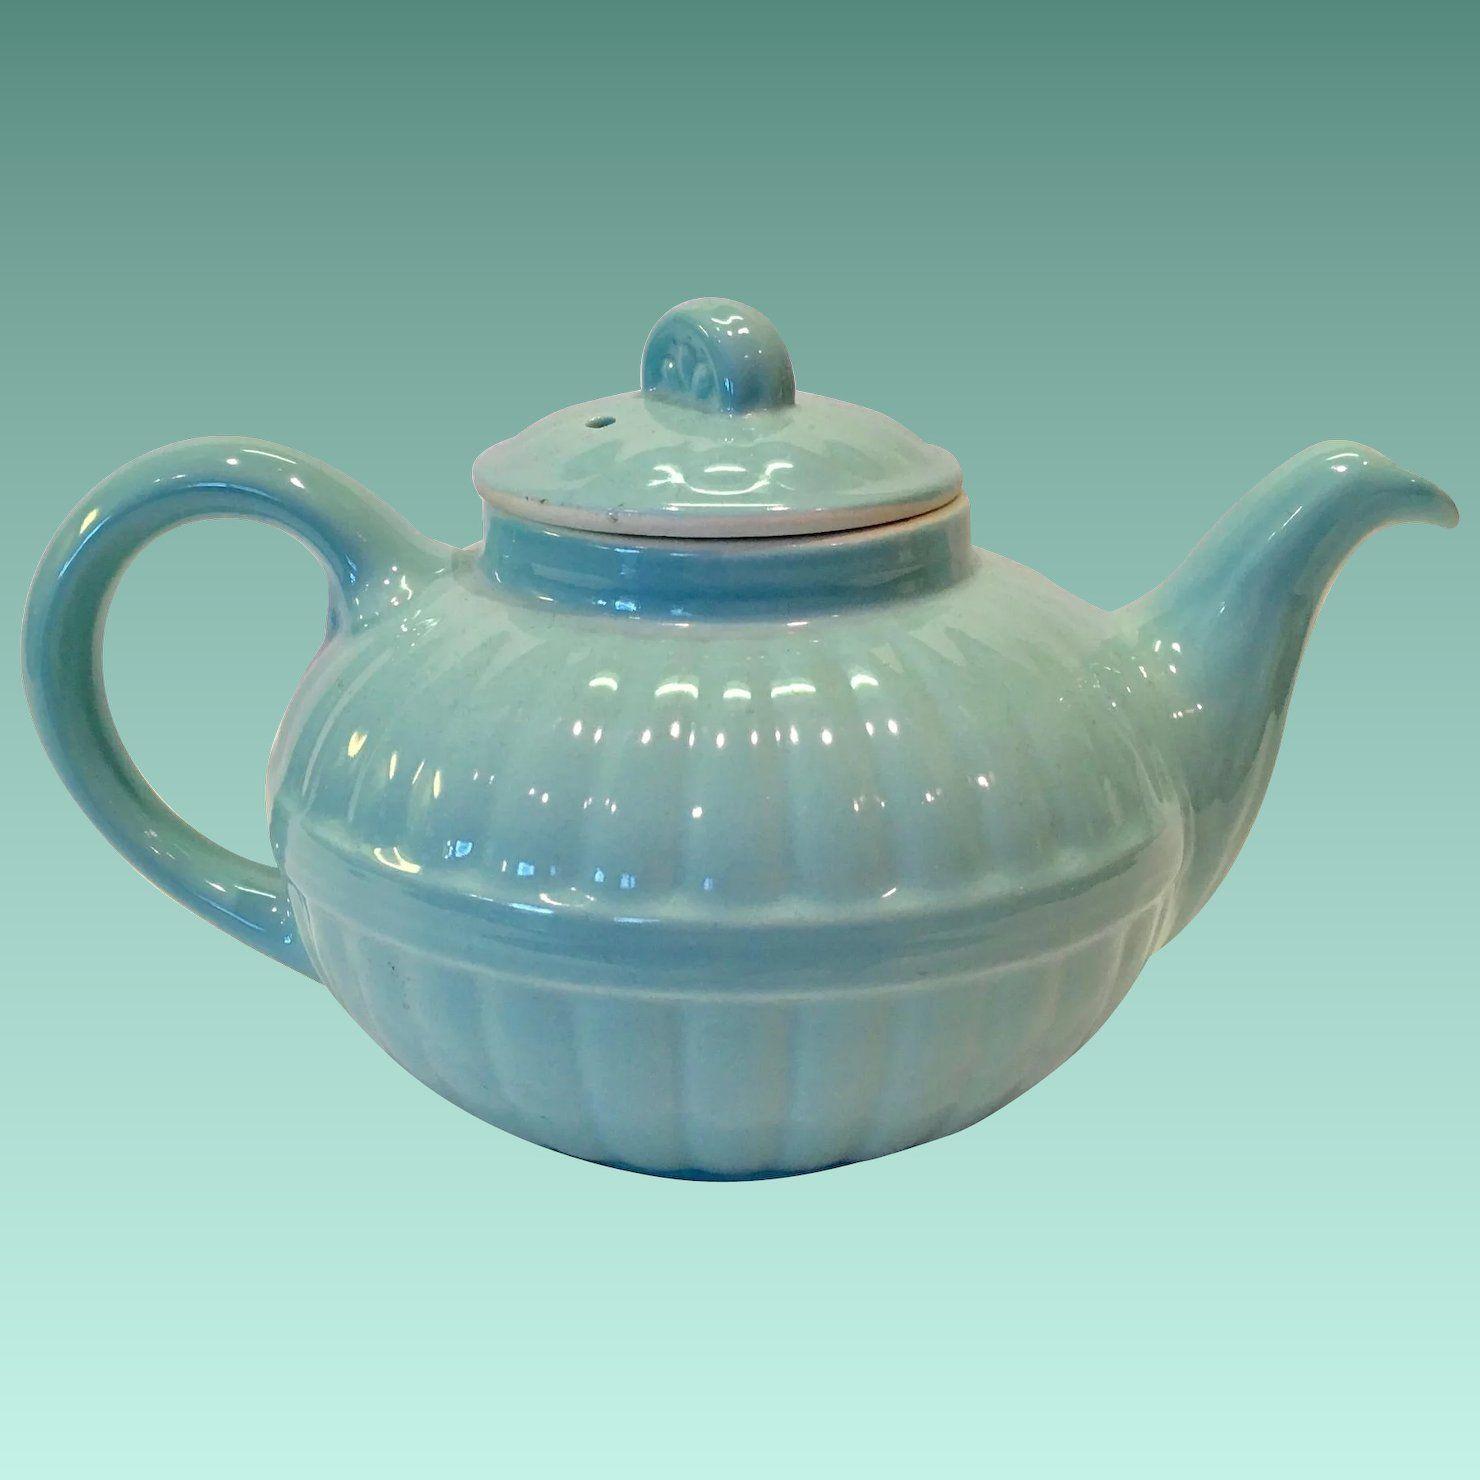 Hall China 1940s Light Blue Murphy Teapot Victorian Series Tea Pots Vintage Dinnerware Bone China Tea Cups